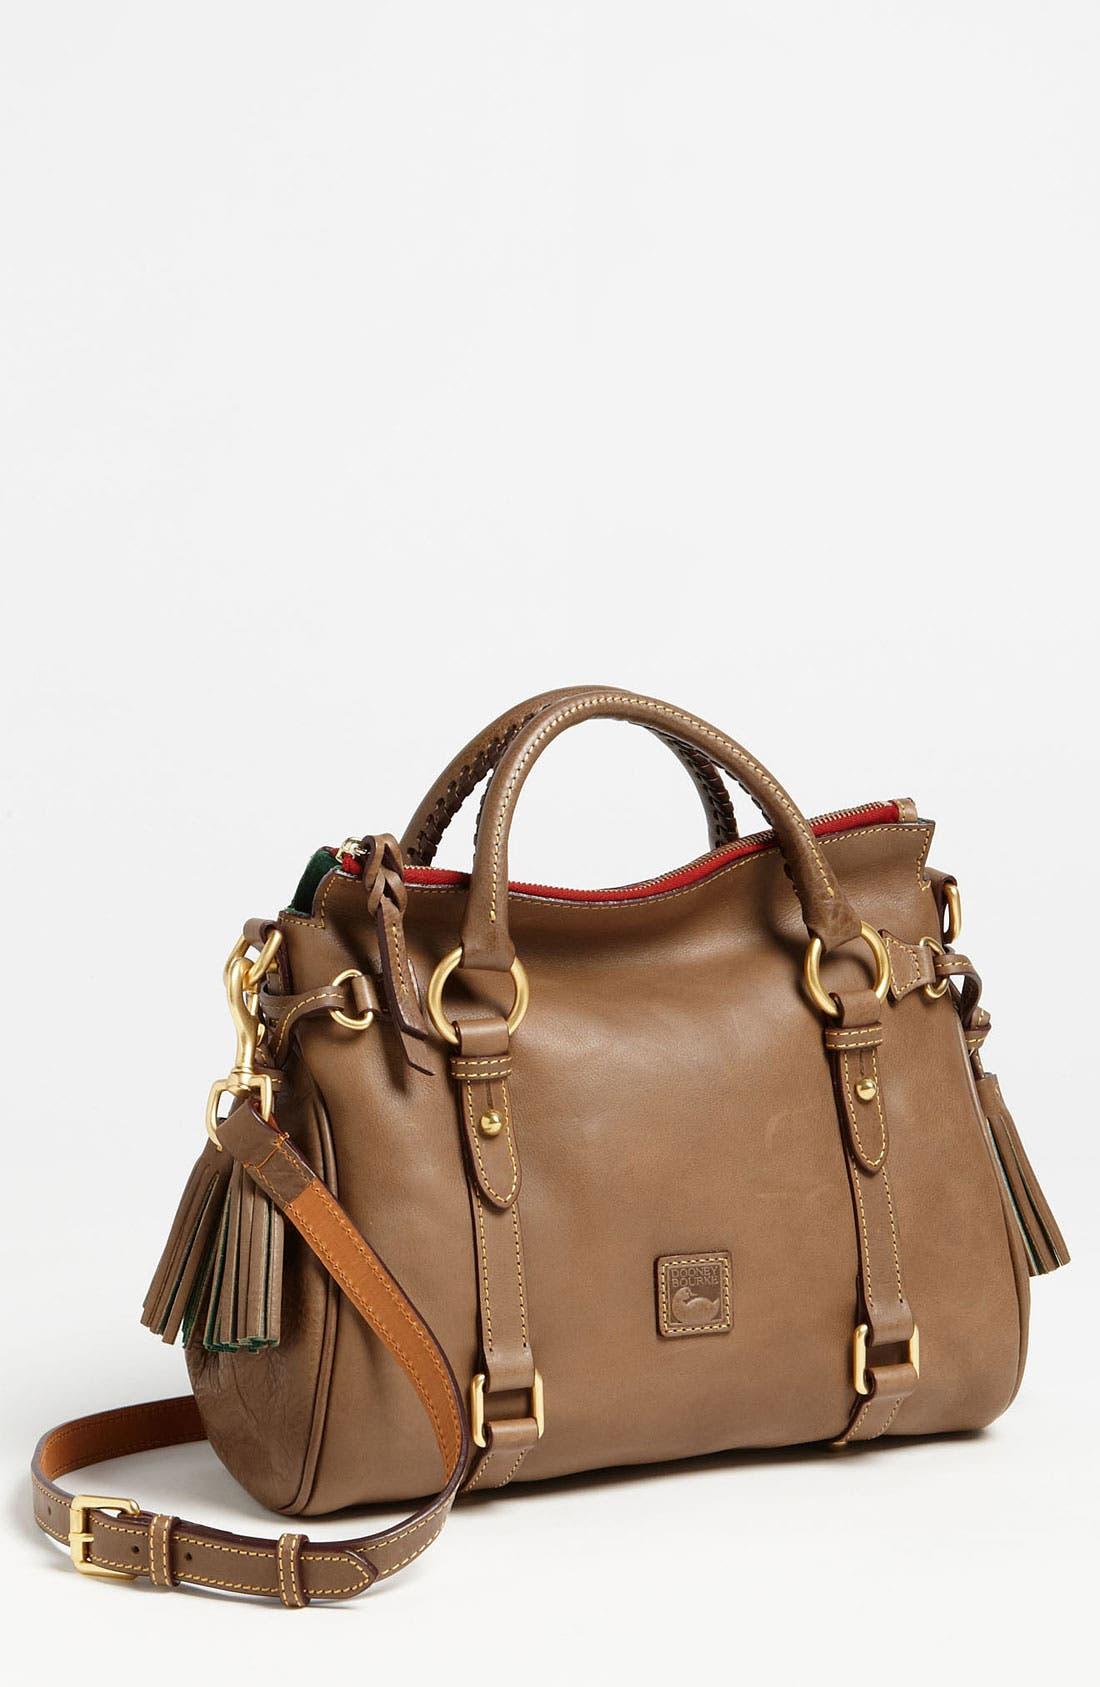 Main Image - Dooney & Bourke 'Florentine - Small' Leather Crossbody Satchel